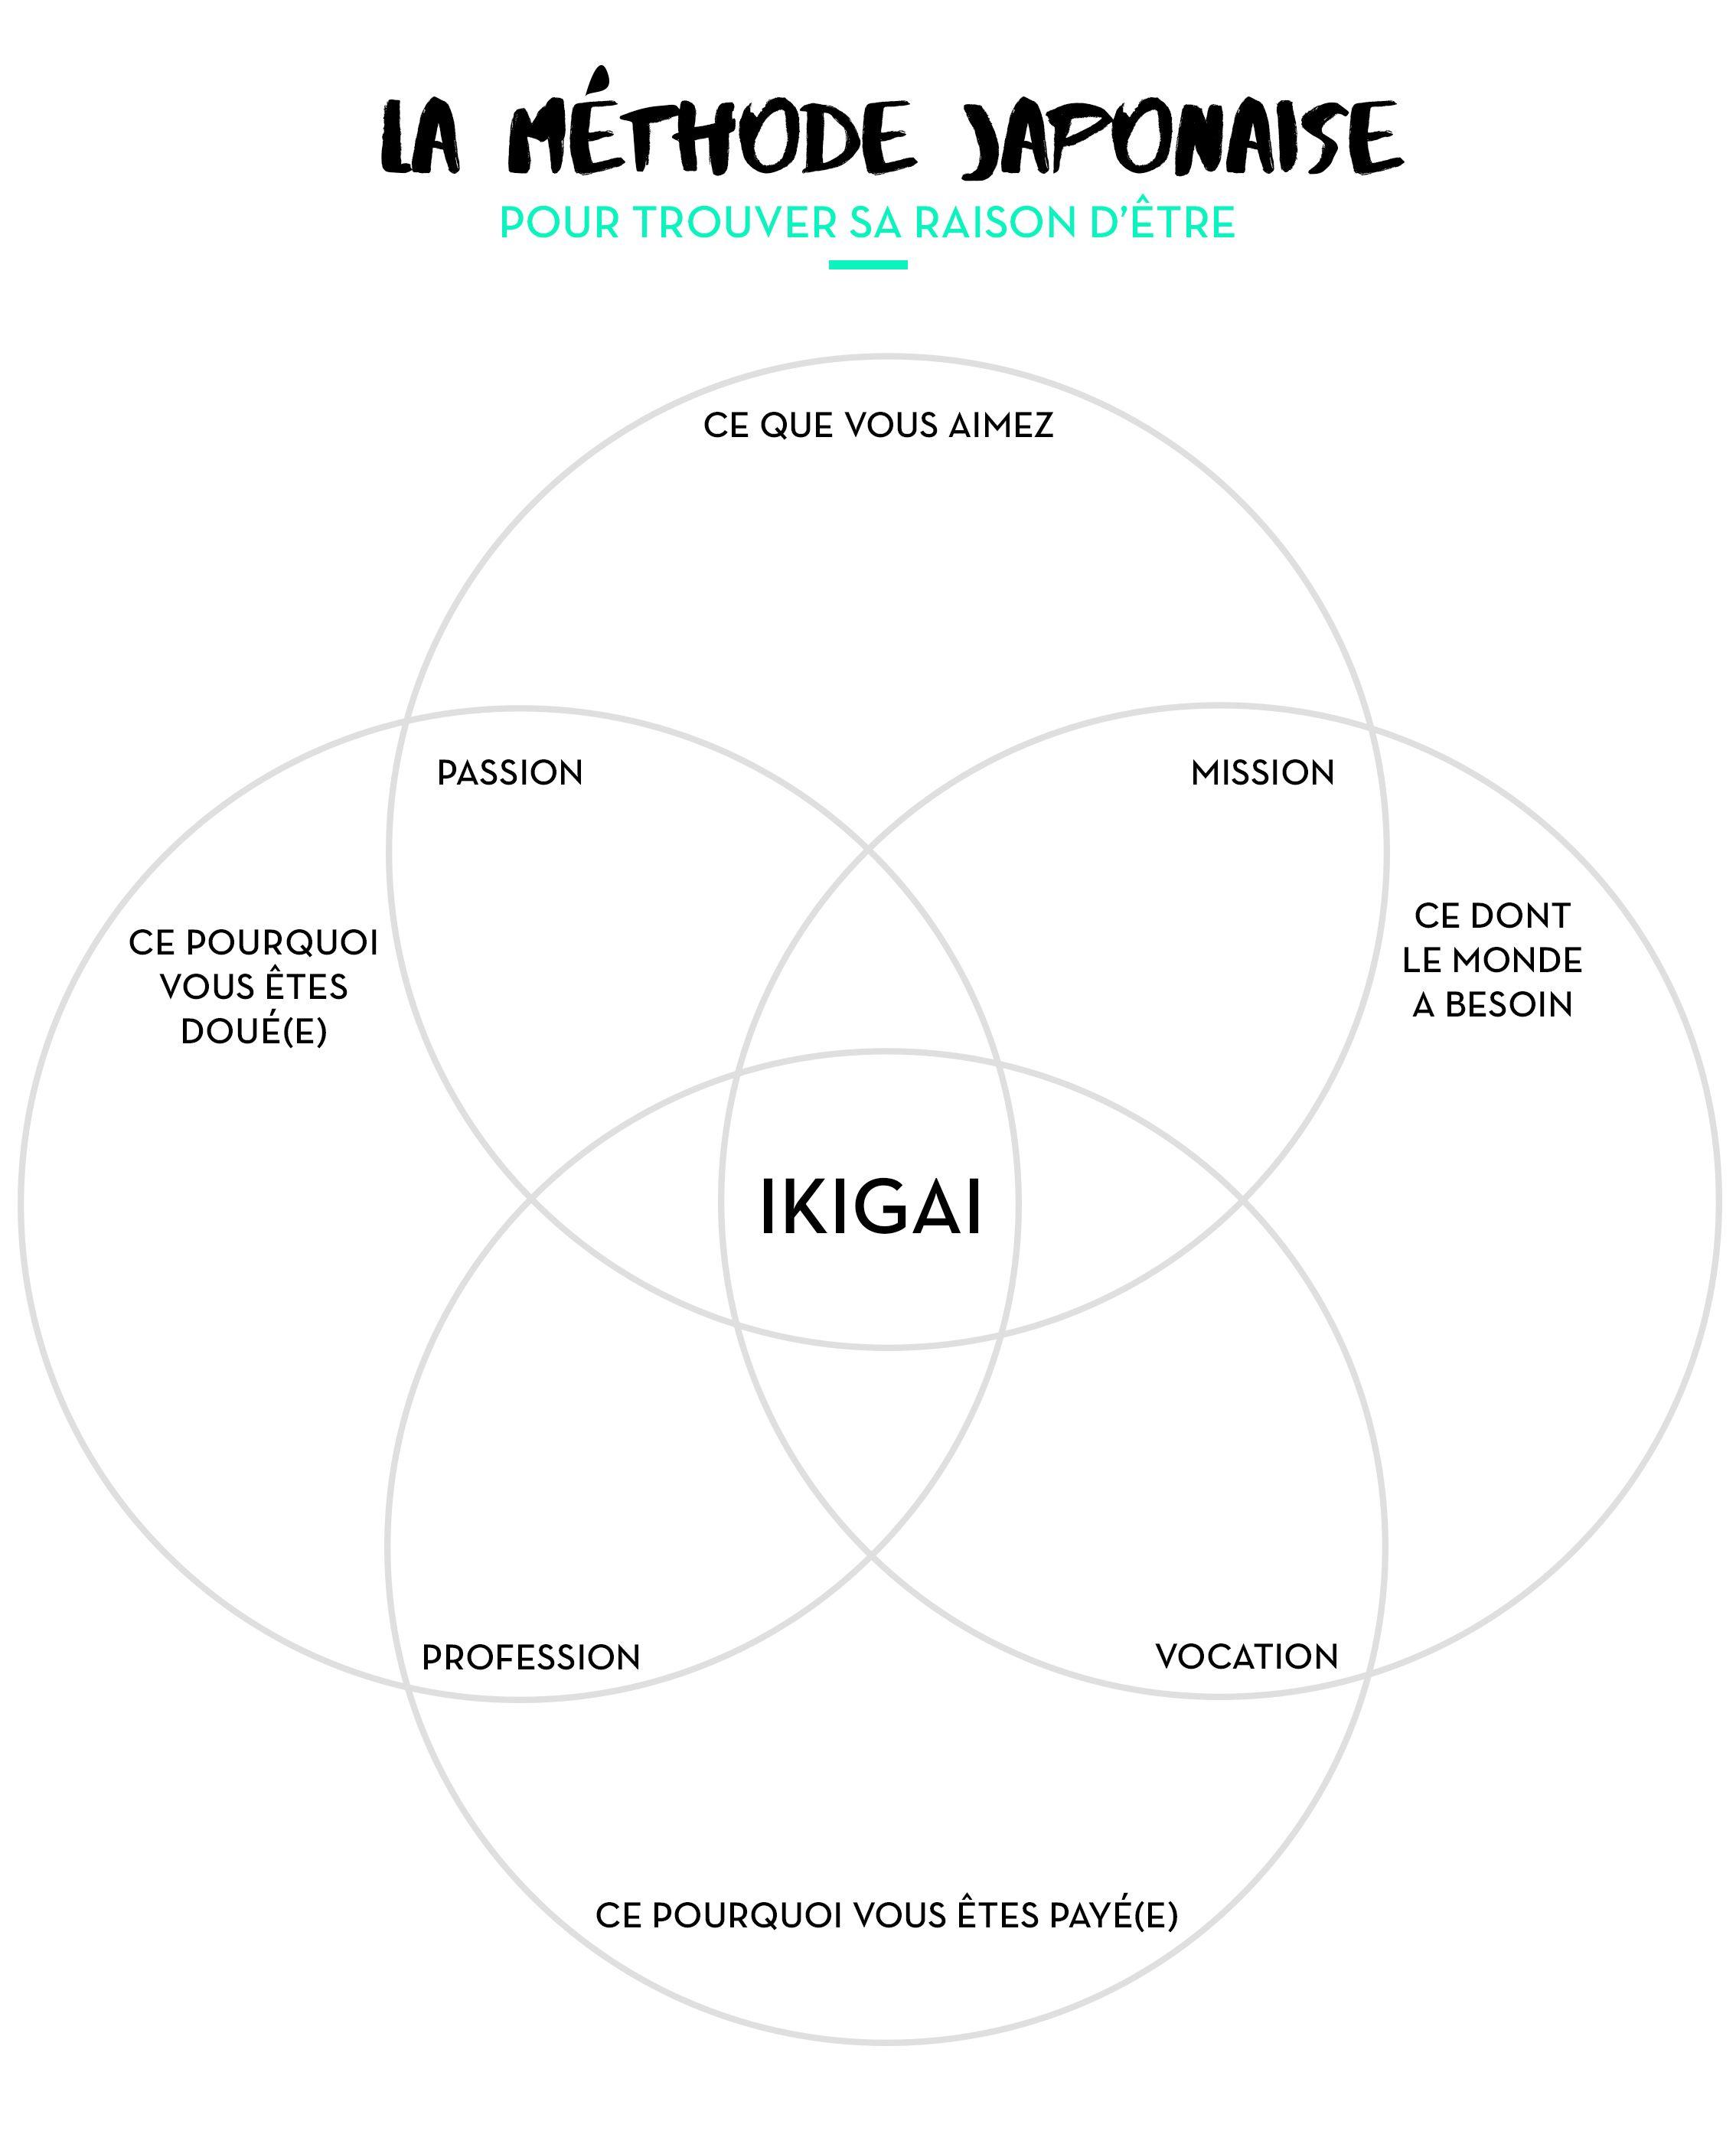 invent u00e9 au 14e si u00e8cle par les japonais  le concept d u0026 39 ikigai r u00e9sume en un mot la grande question